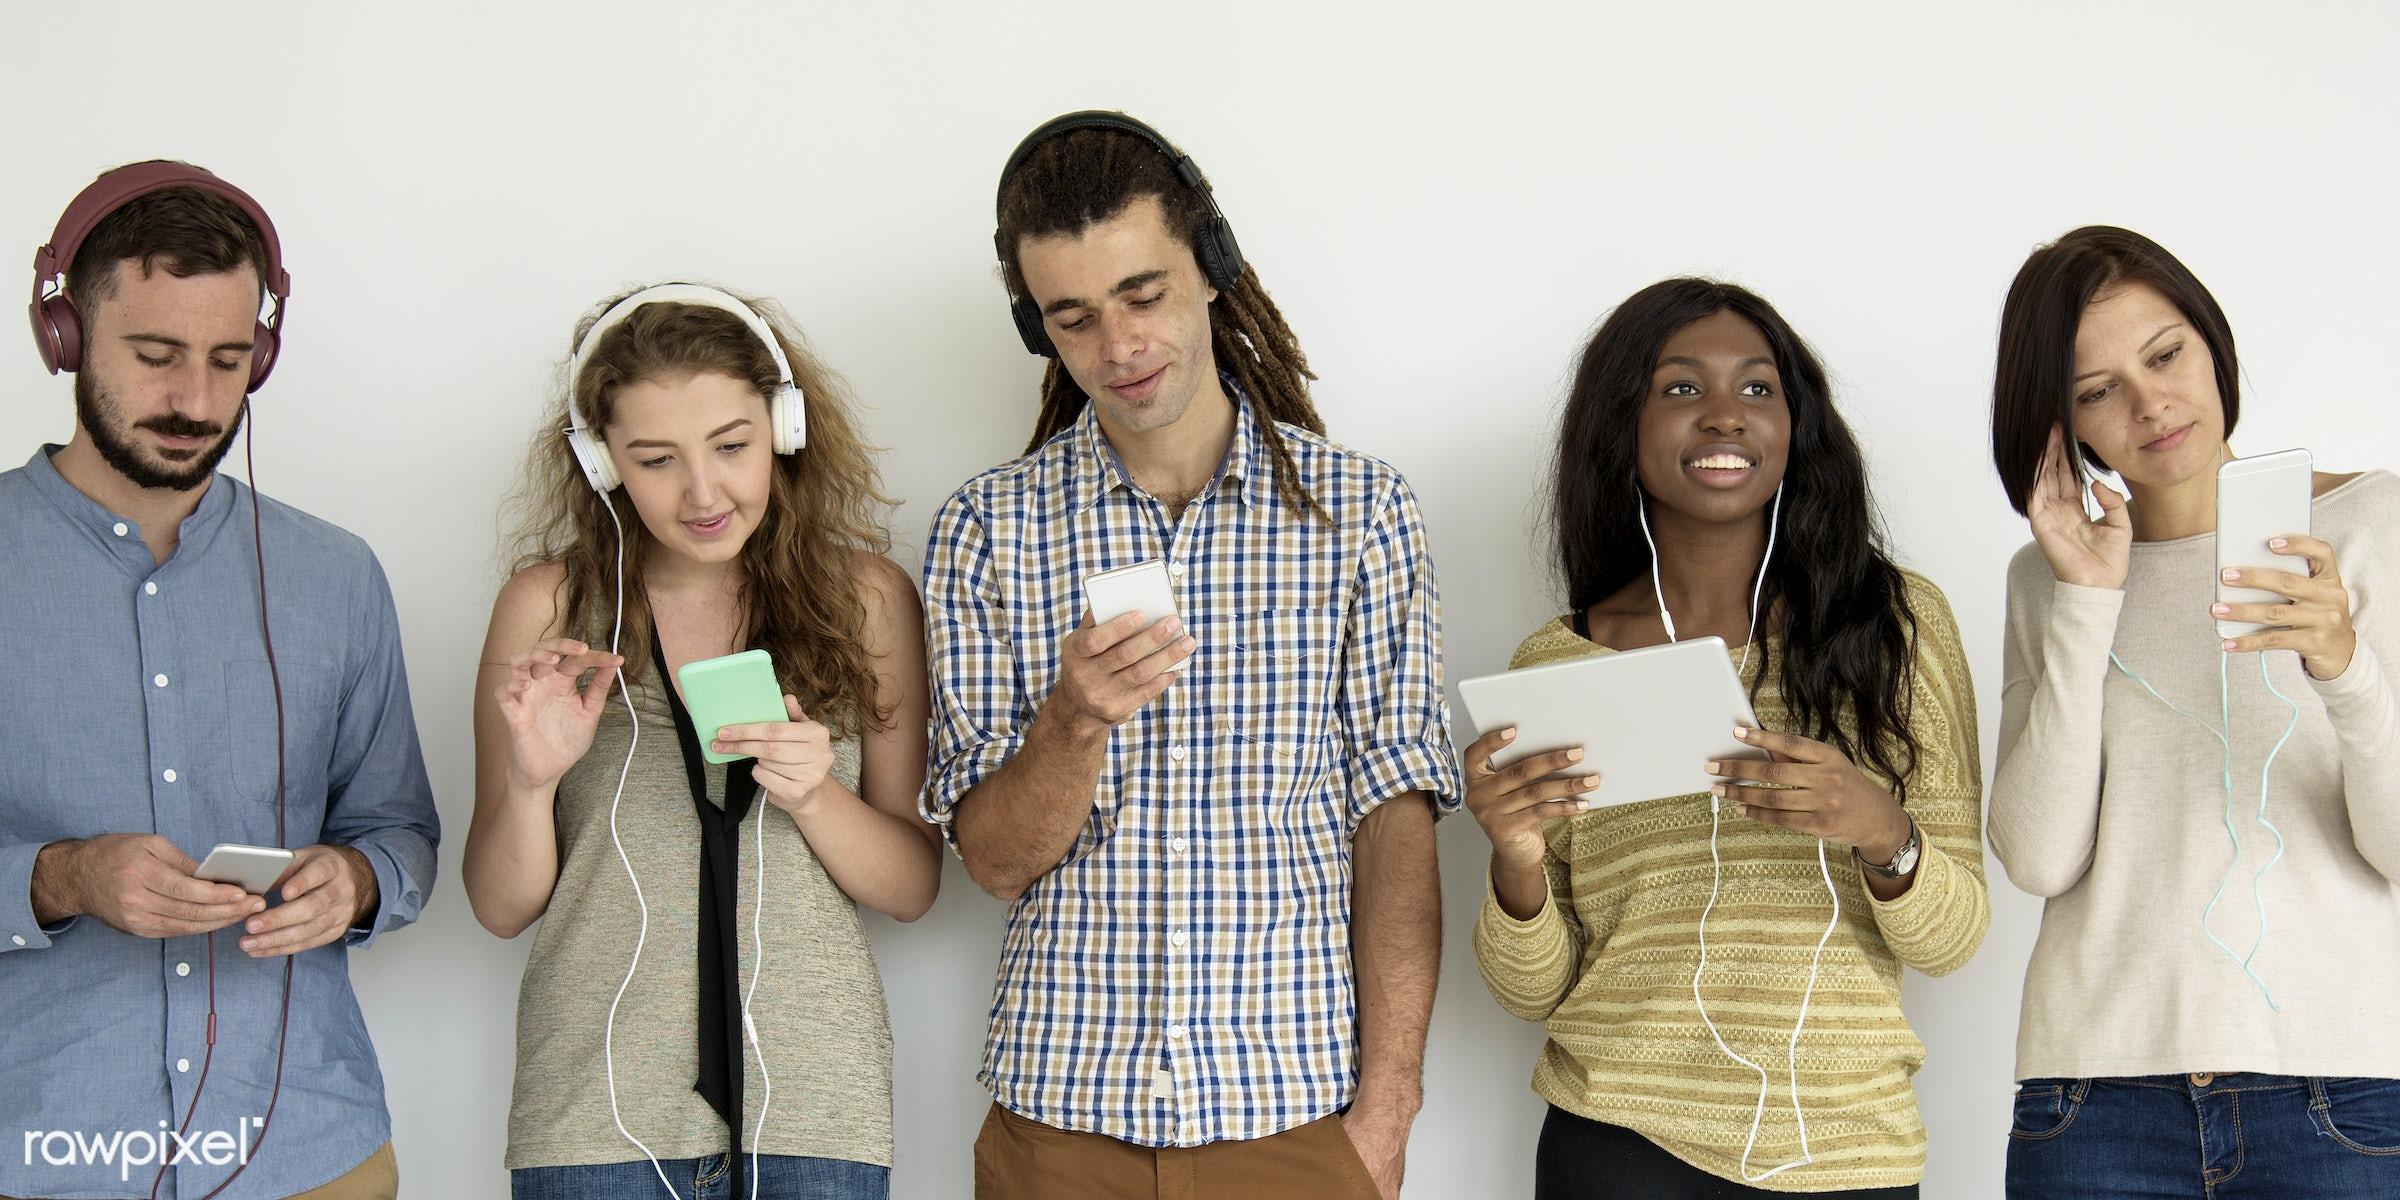 studio, song, headset, phone, diverse, digital, people, girl, friends, woman, casual, friendship, jam, playlist, smart phone...